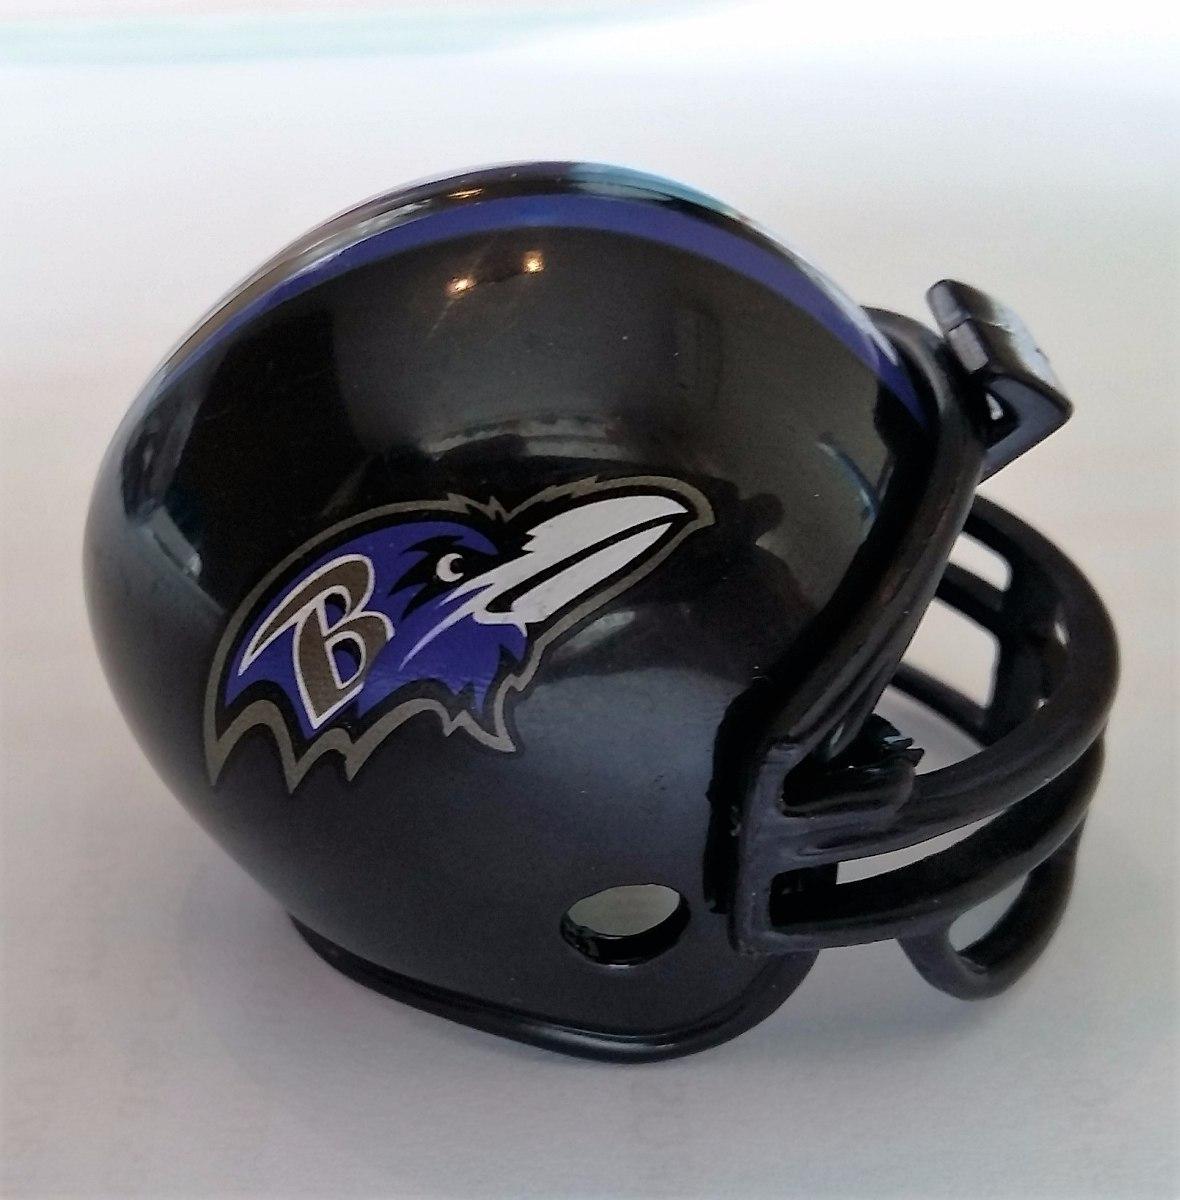 mini capacete nfl - balimore ravens. Carregando zoom. c0b9ee1d89e31